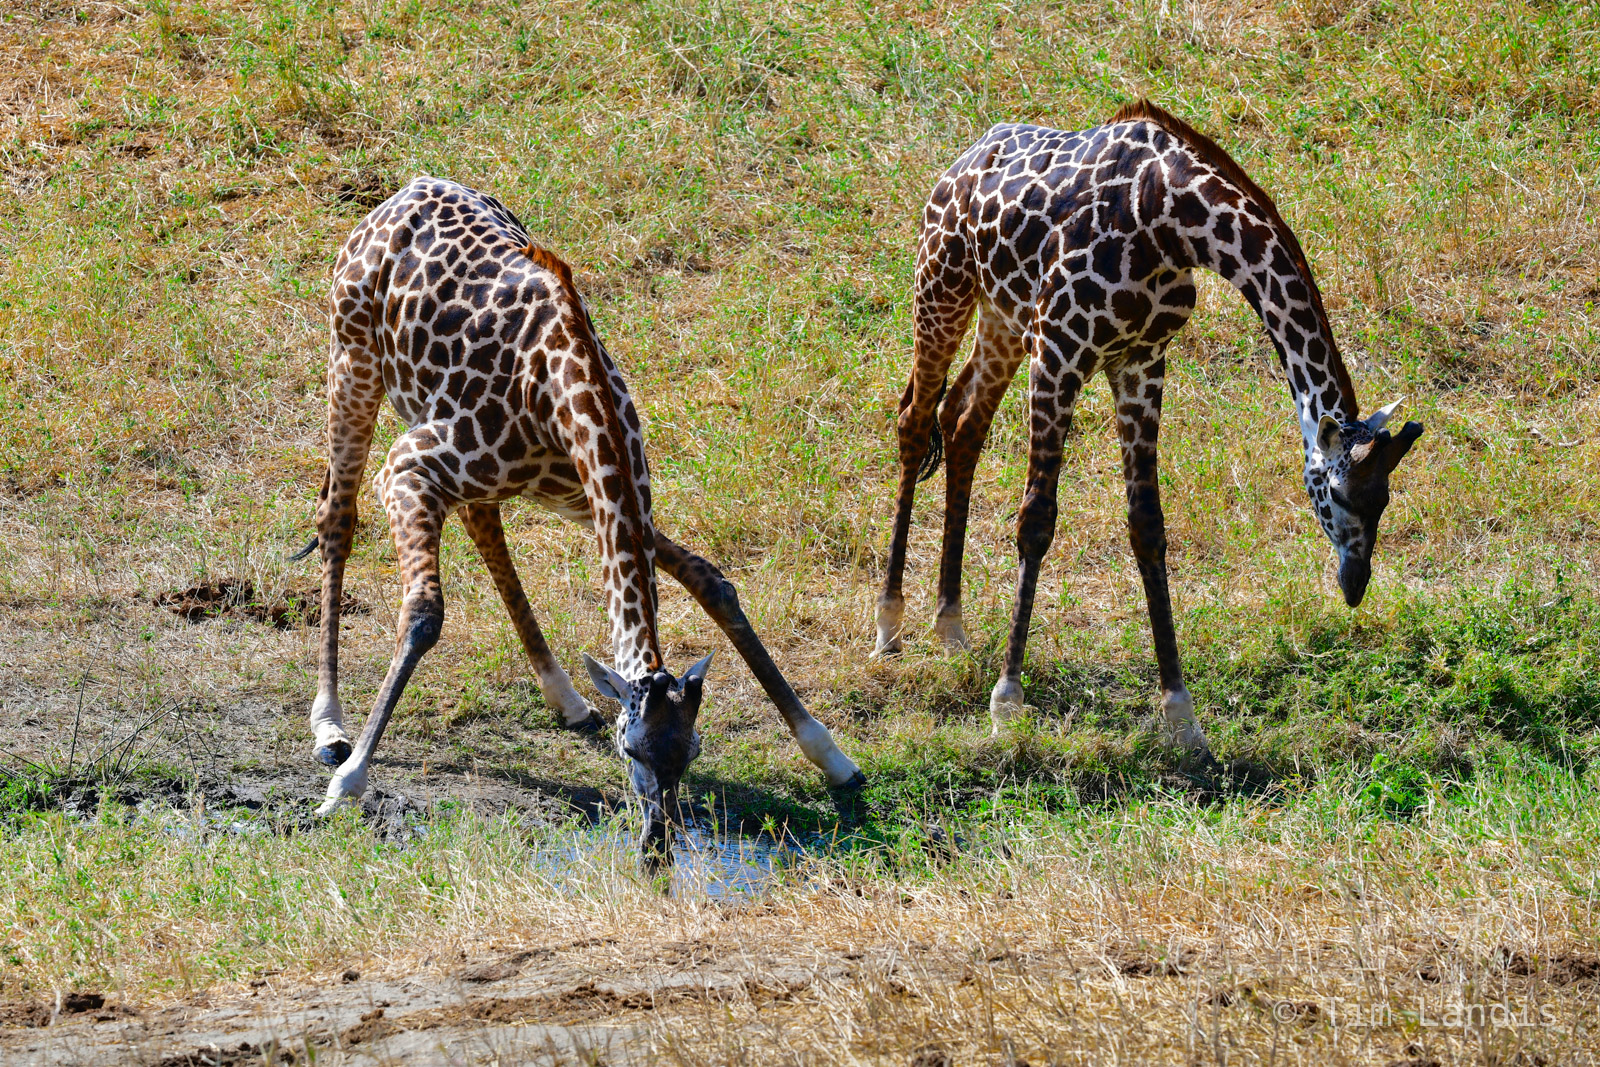 Kenay, giraffes drinking, photo